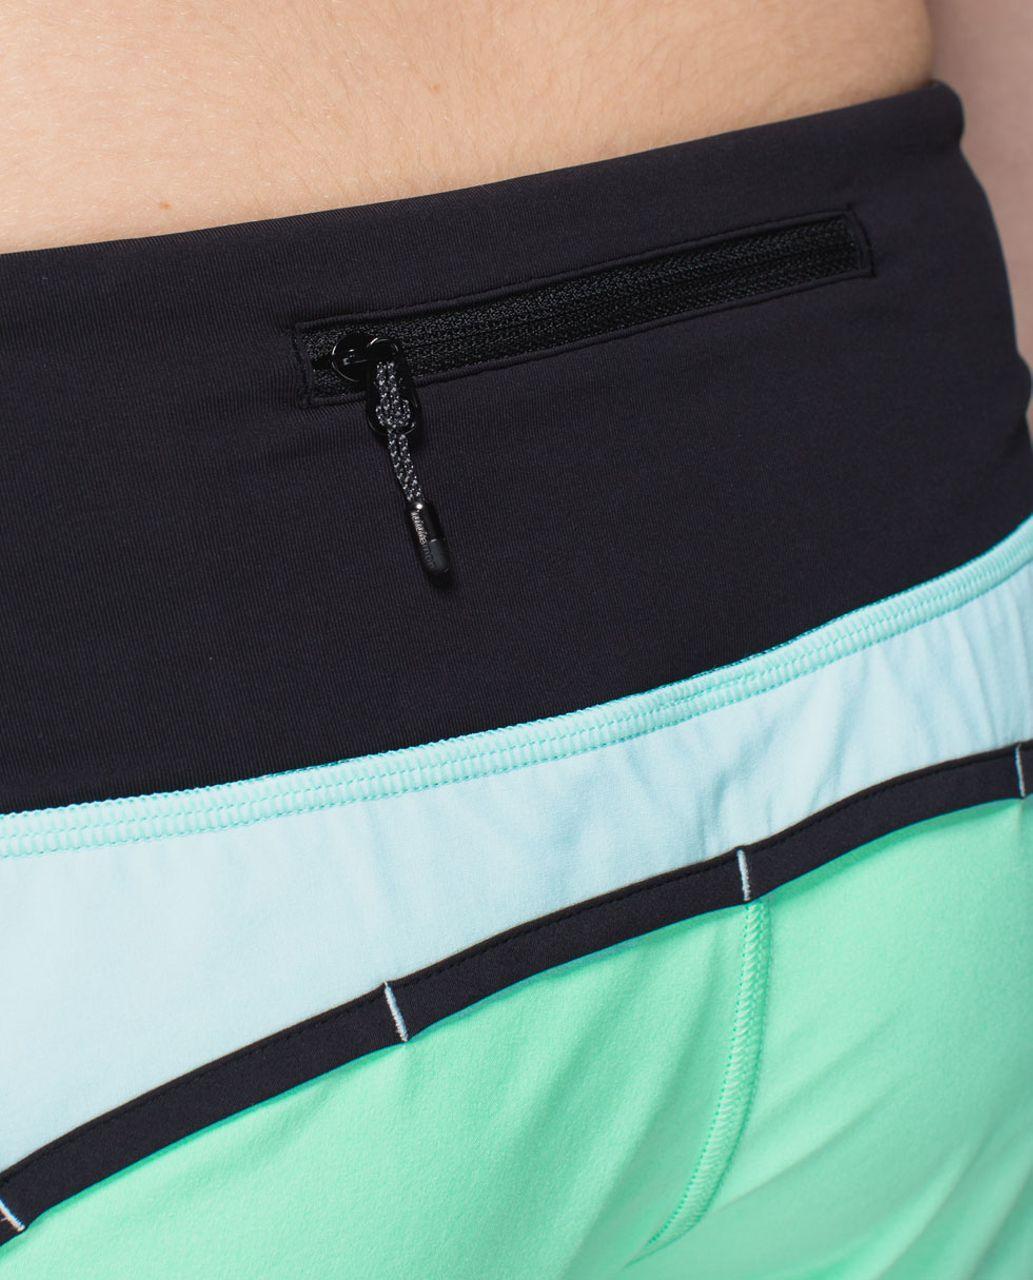 Lululemon Run Times Short *4-way stretch - Opal / Aquamarine / Black